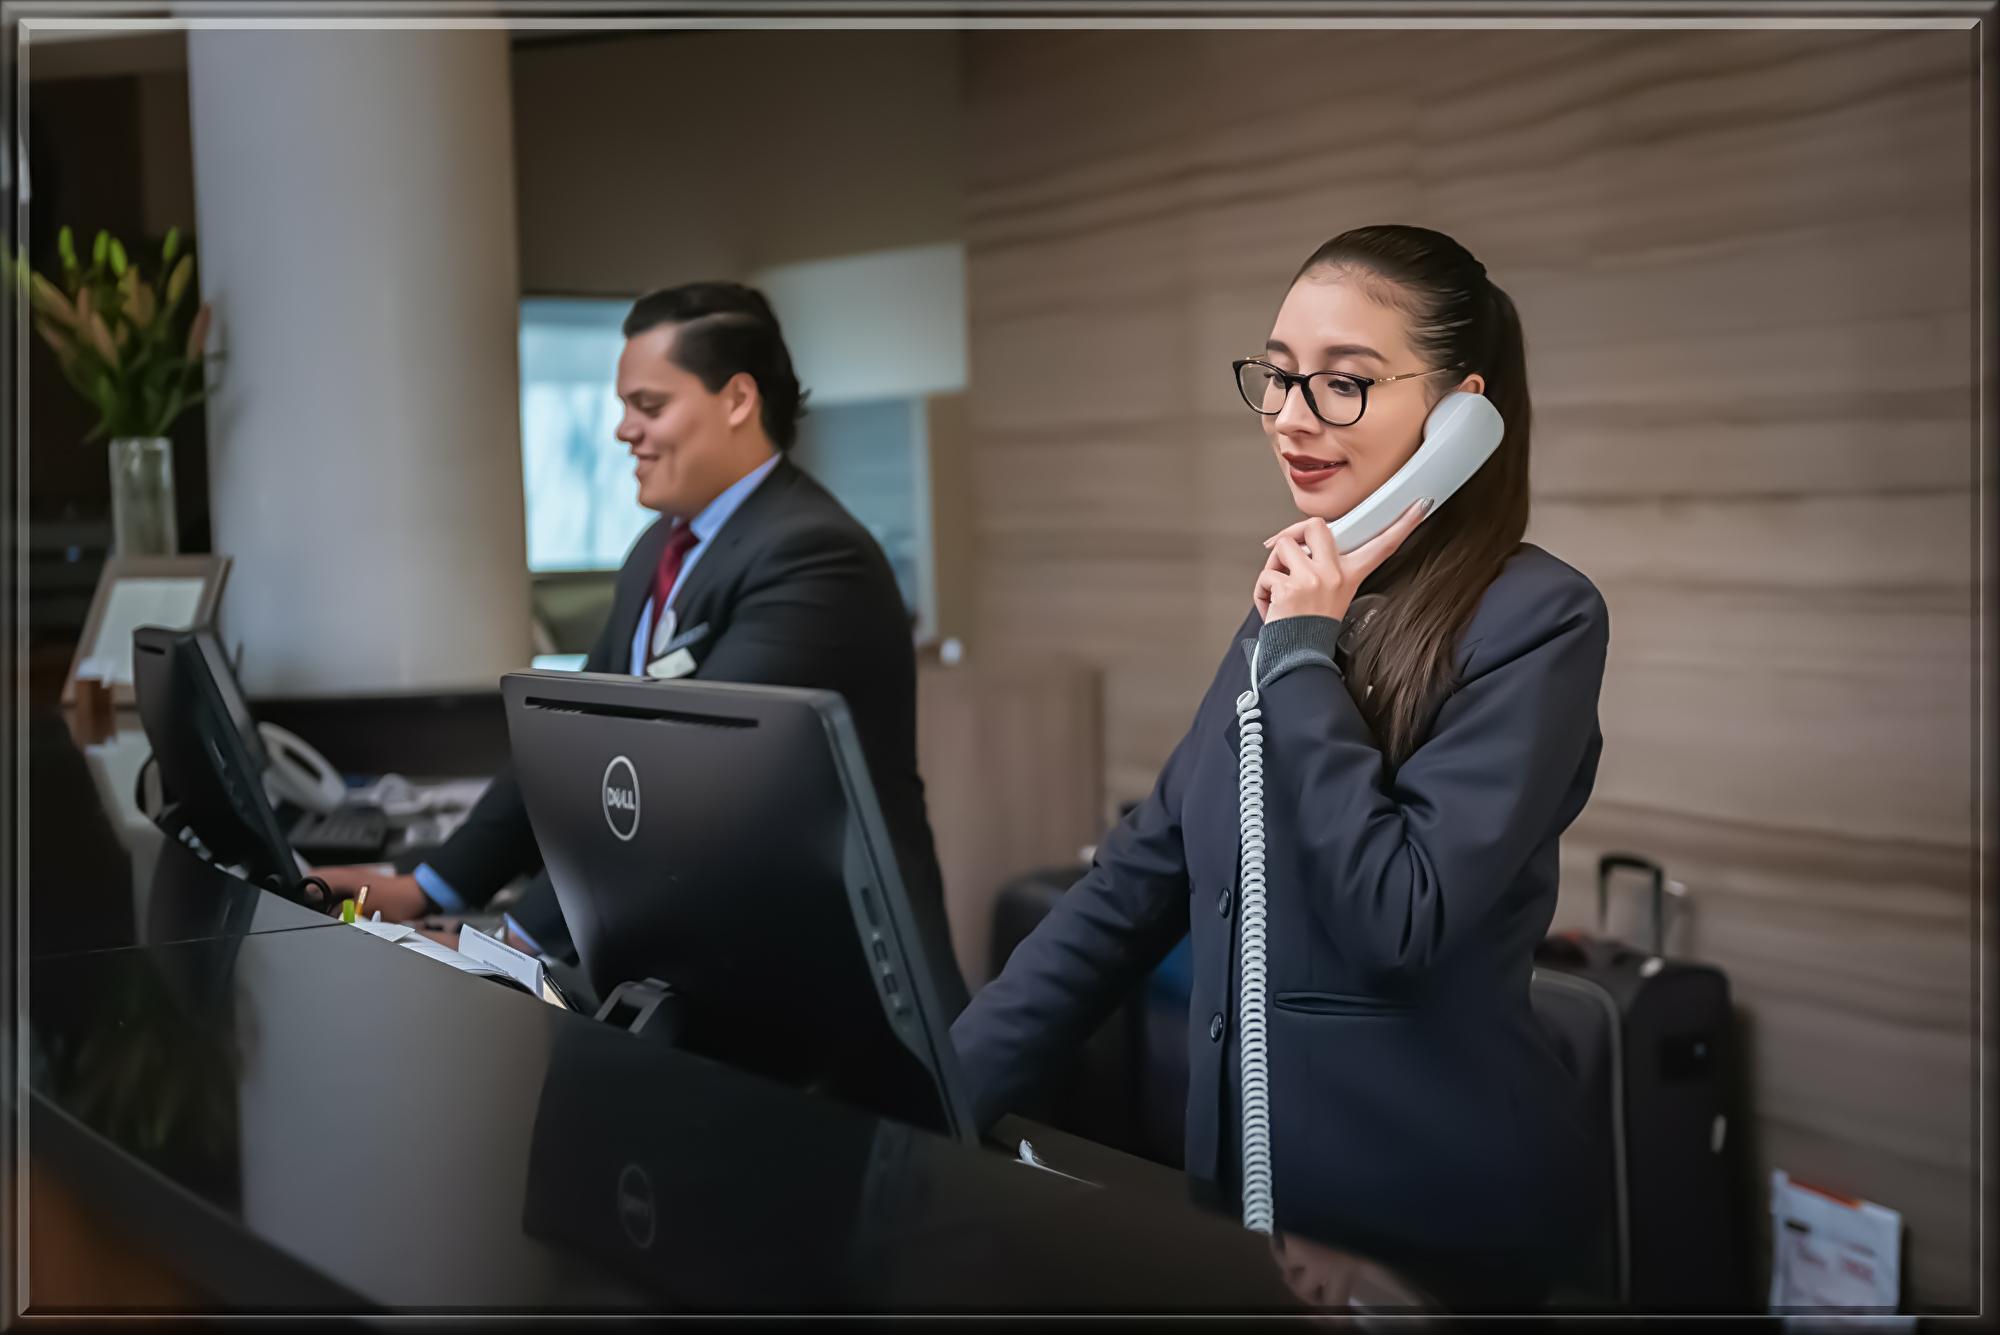 receptionists-5975962.jpg